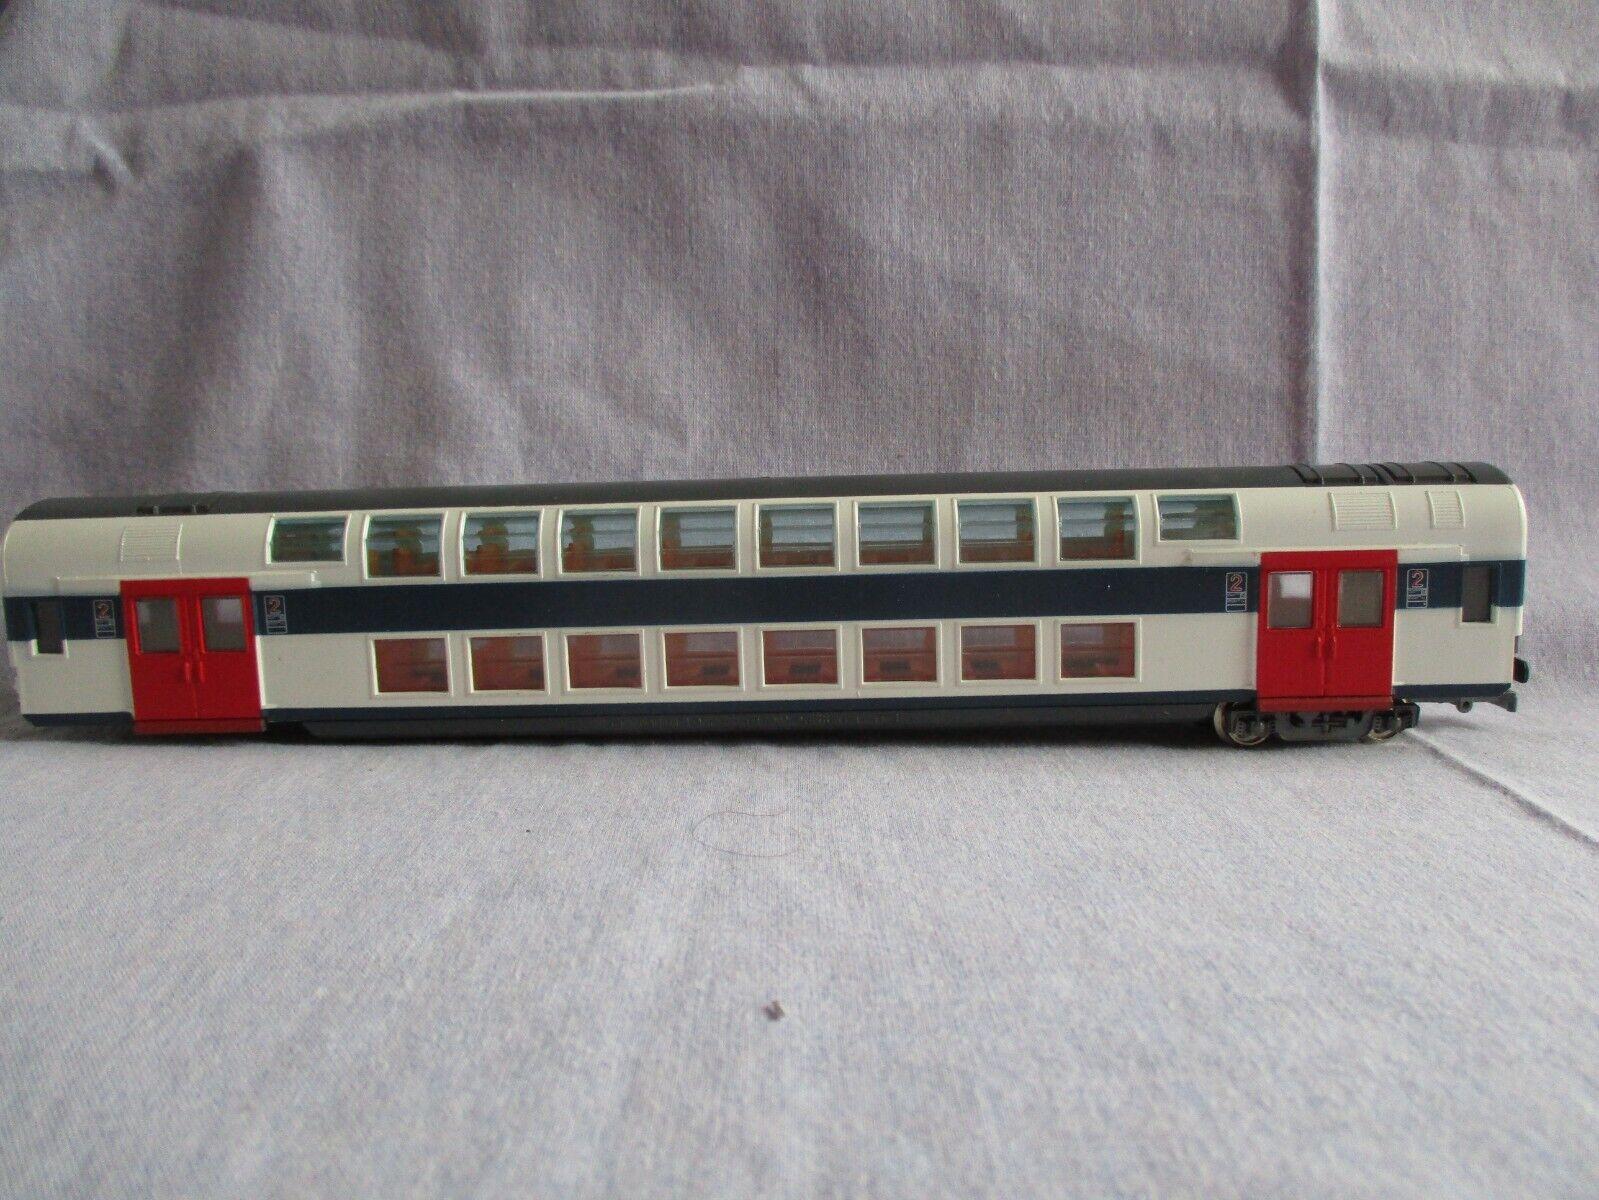 Aq364 jouef ho 1/87 voiture voyageurs type be 2n sncf 2eme classe duplex rf 5092